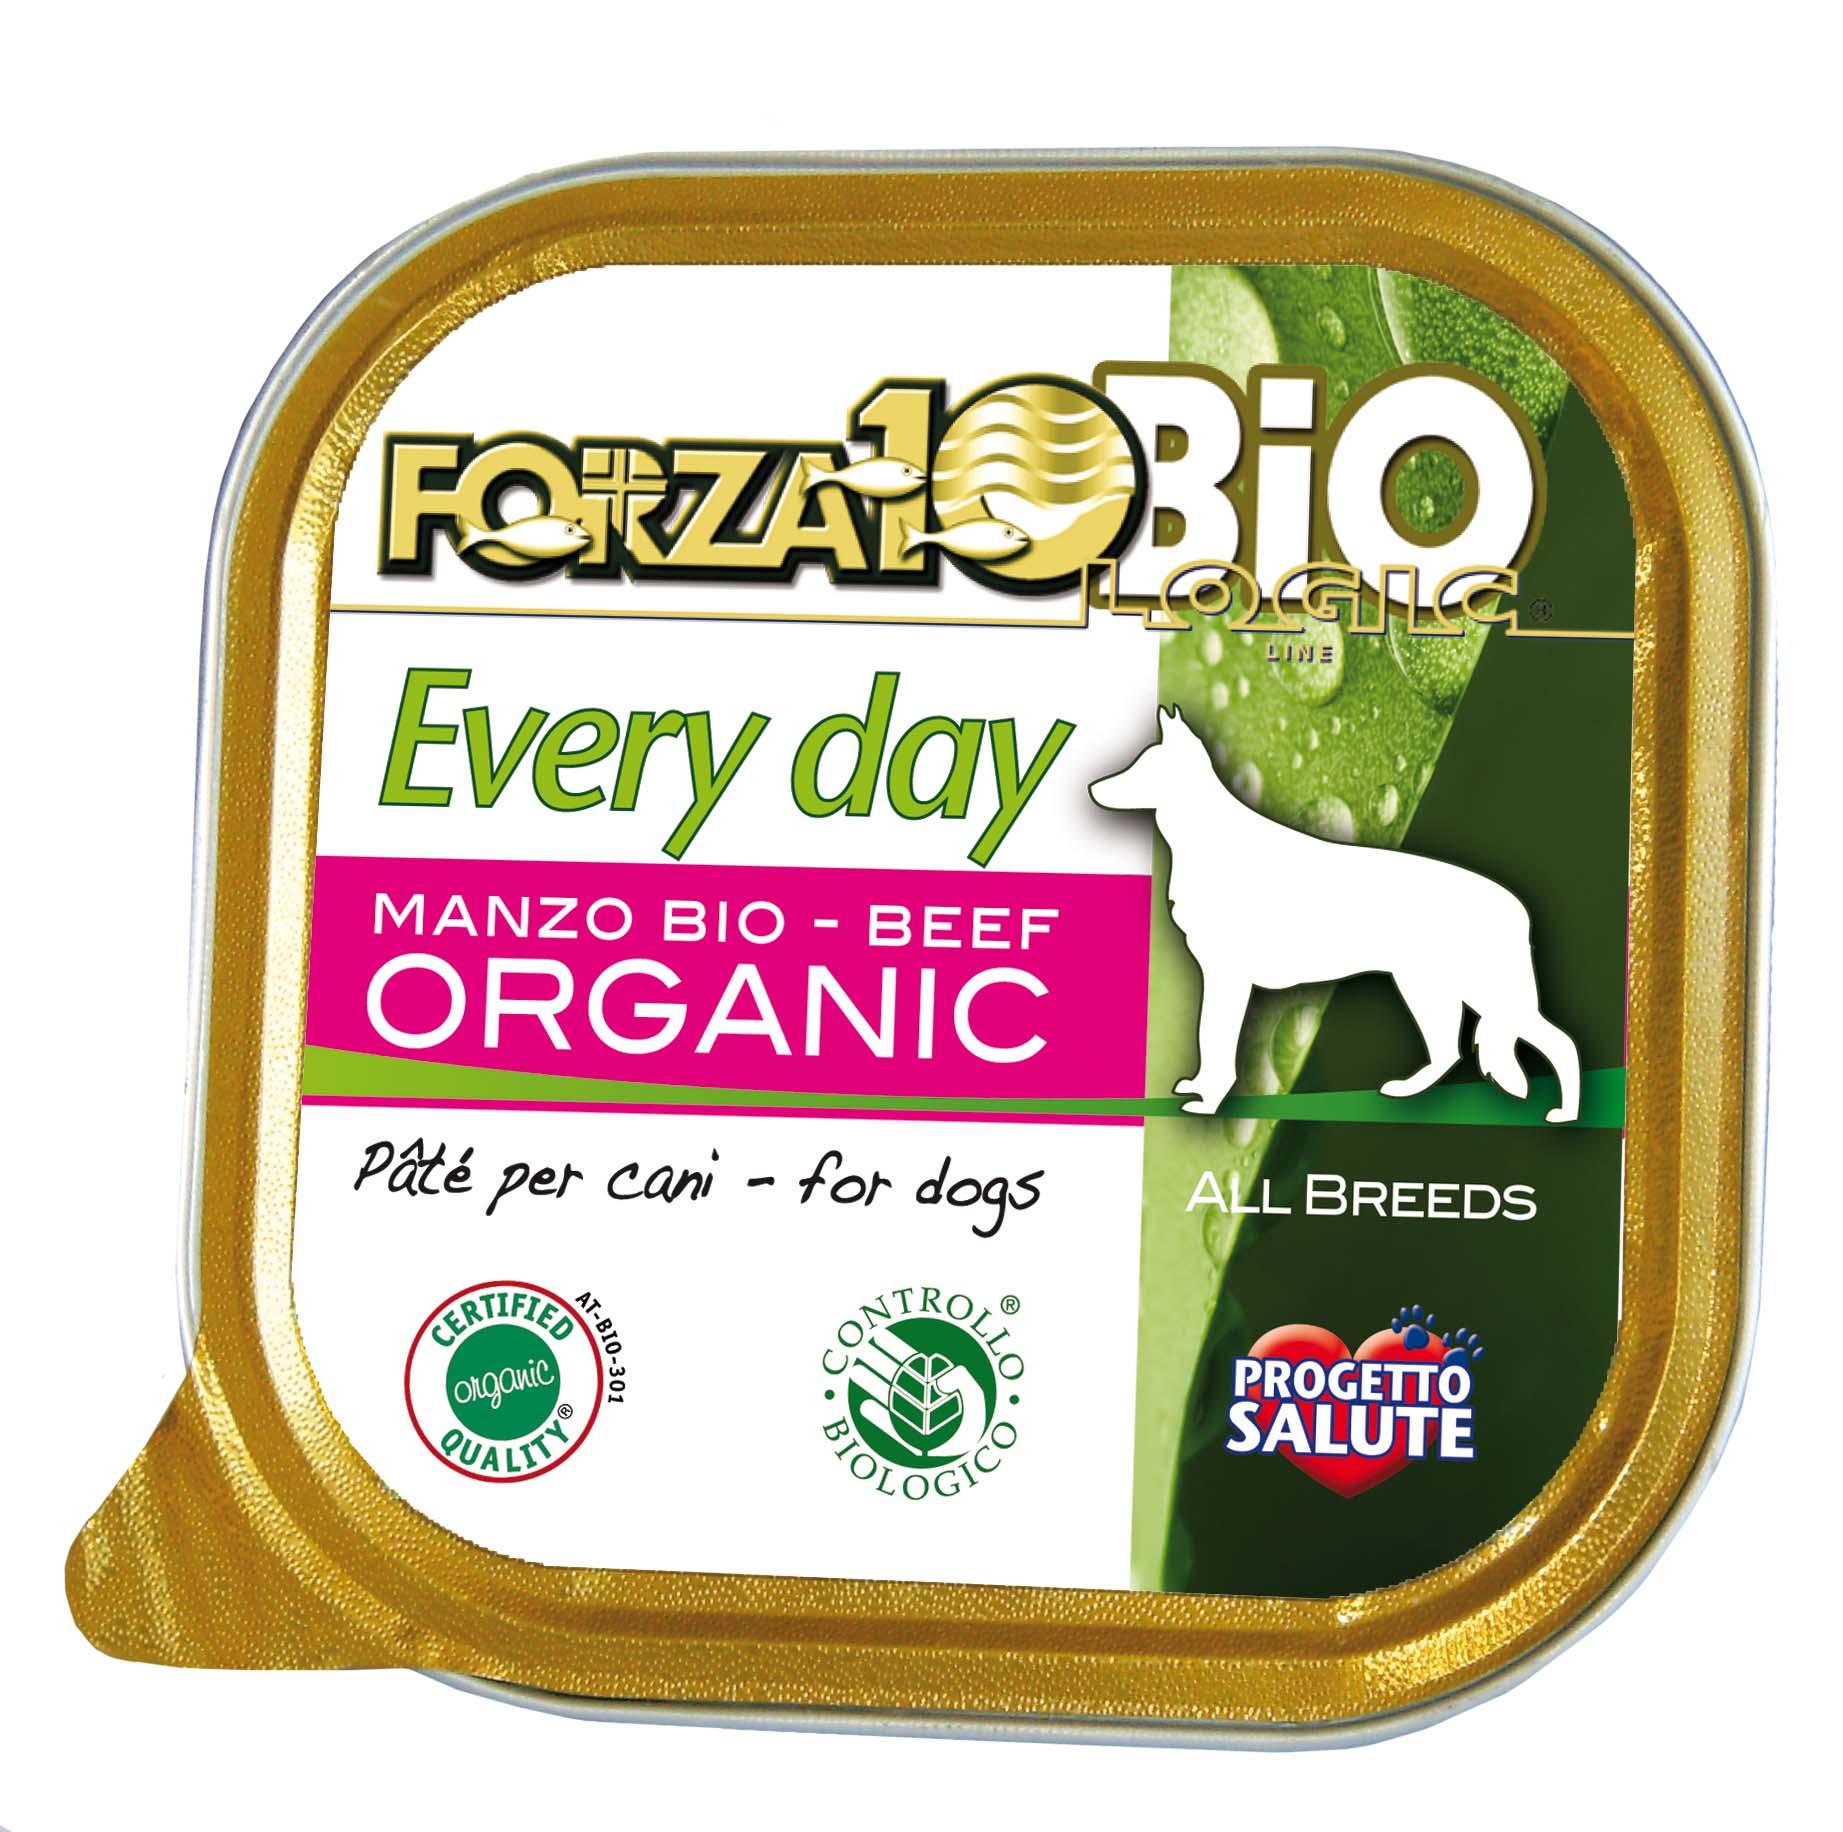 FORZA10 BIO - Every Day PERRO Ternera 100g